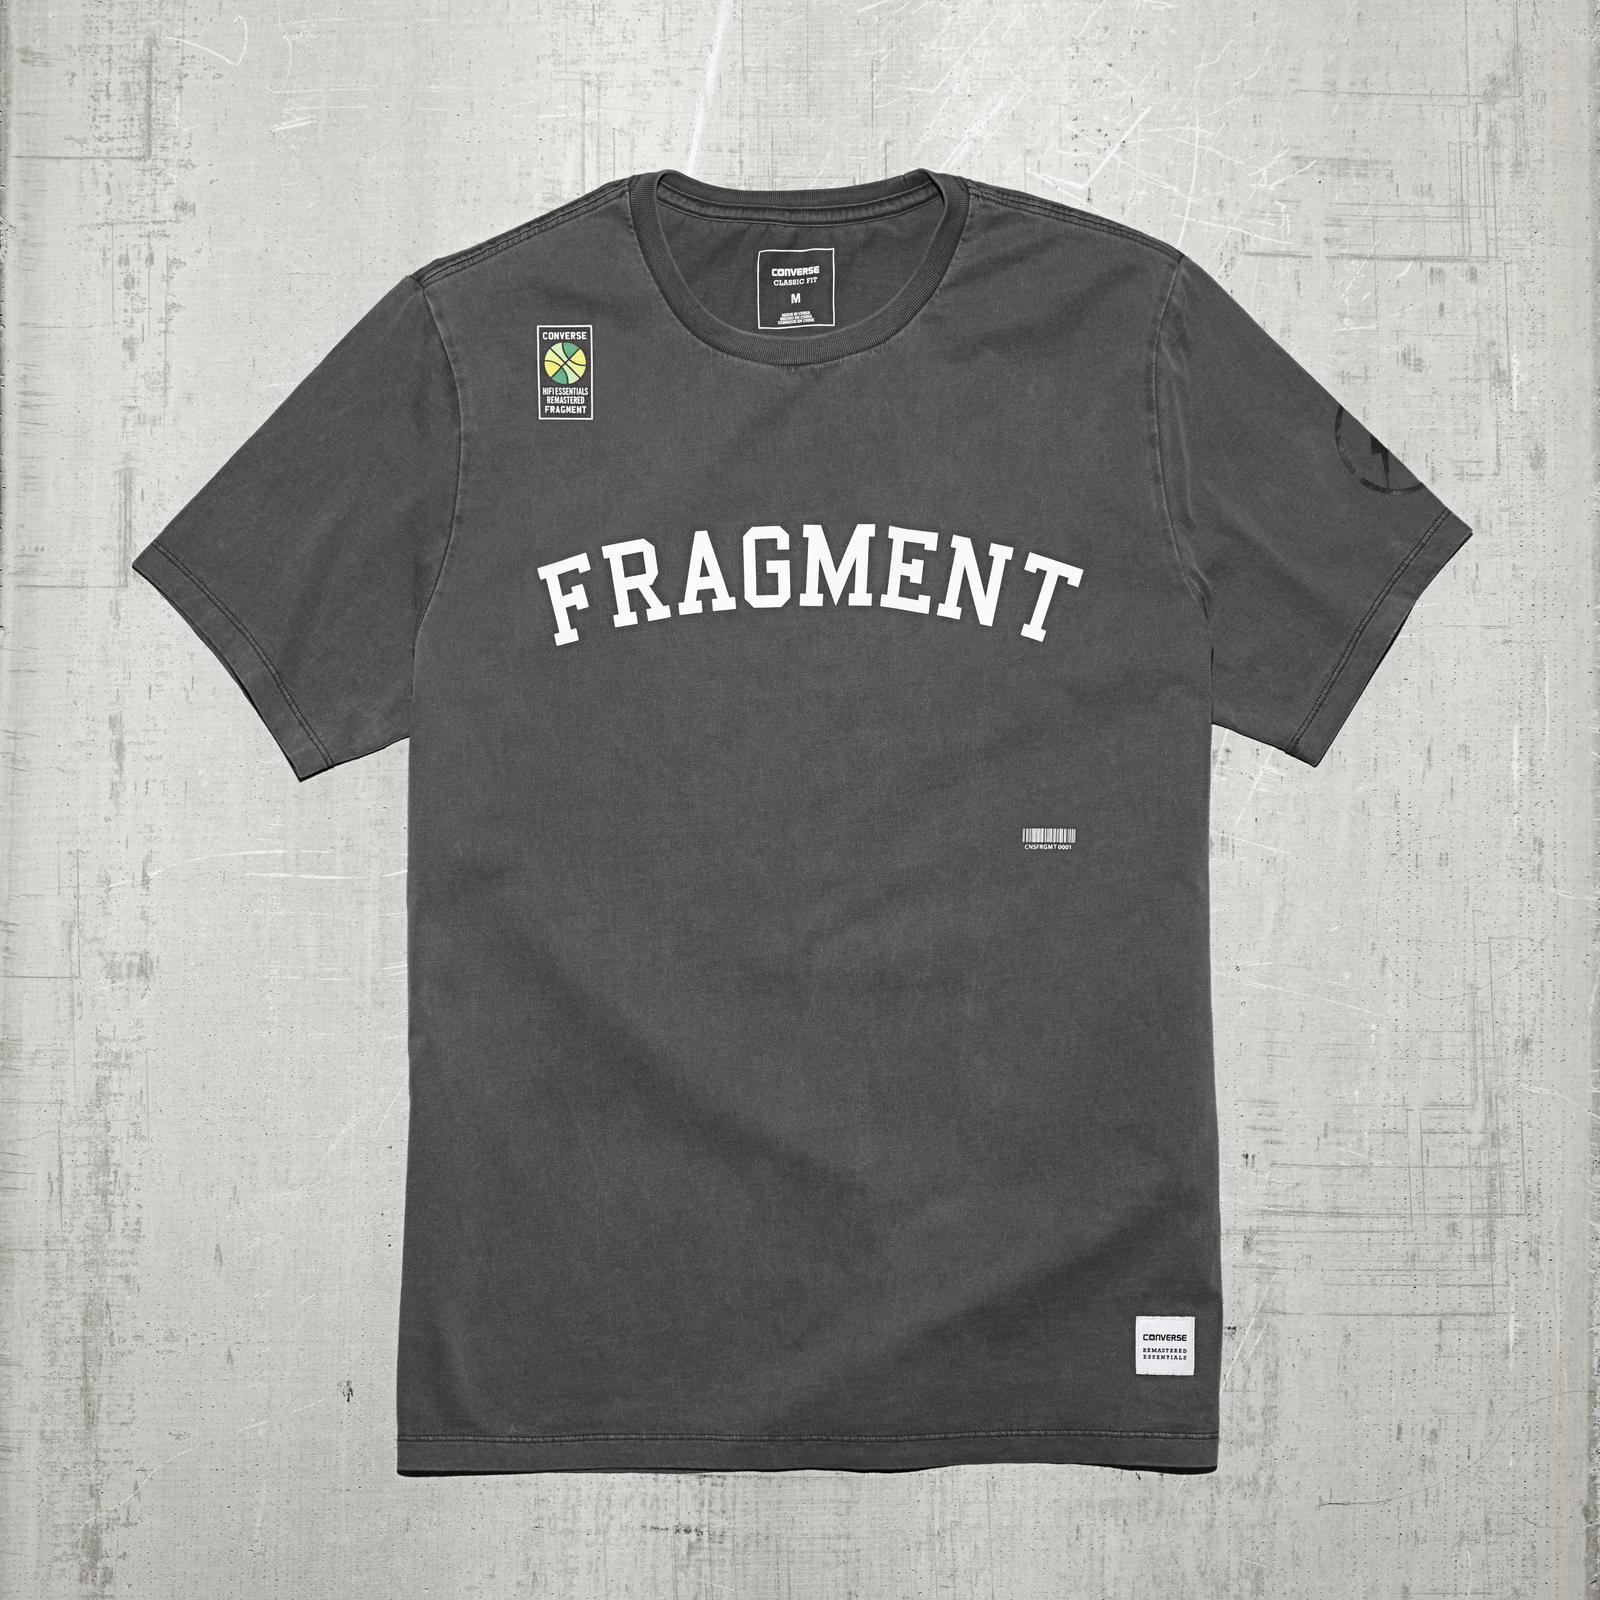 Fh16 apparel fragmen tee profile square 1600